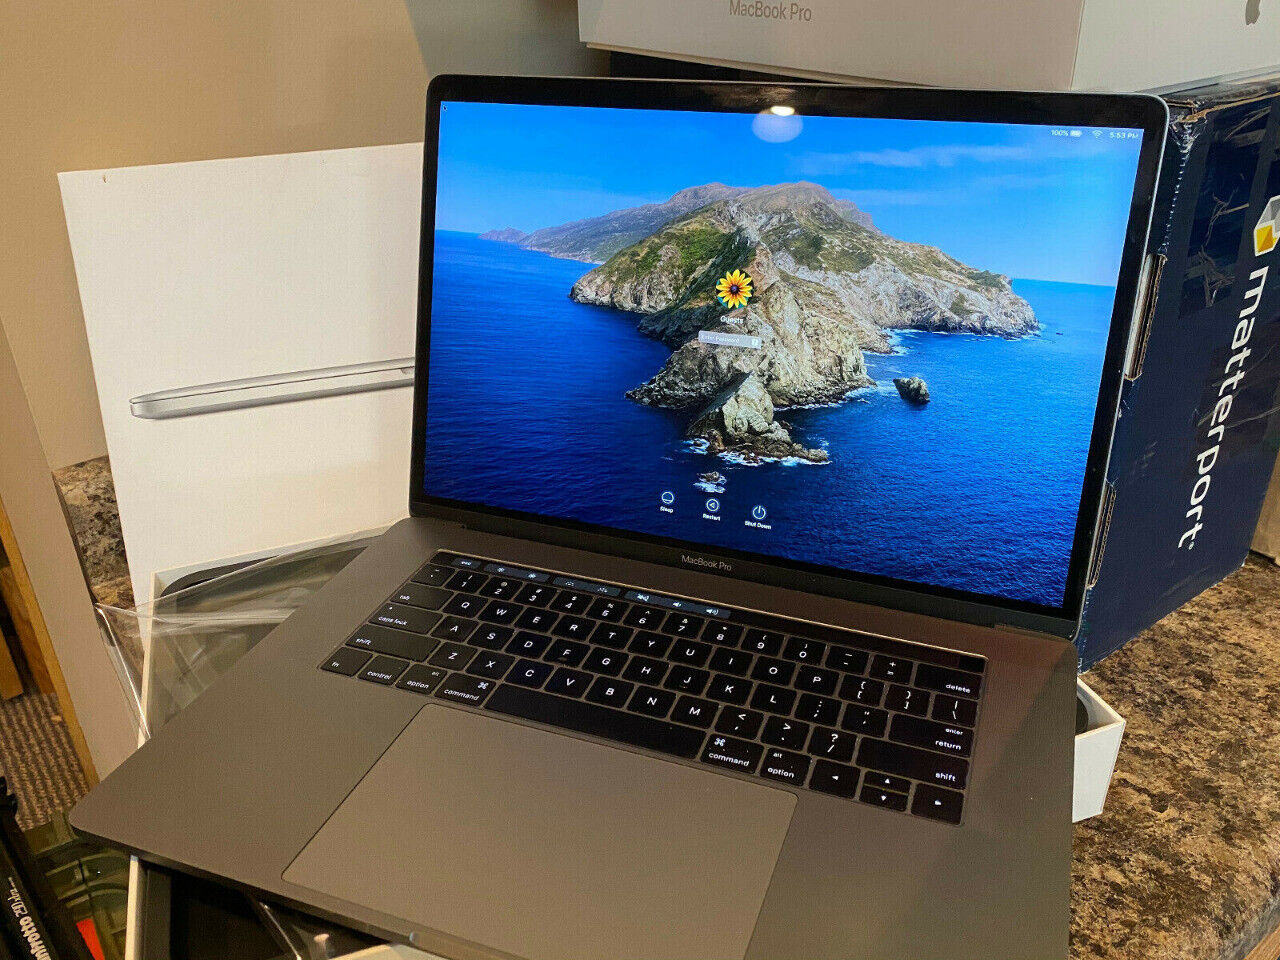 Macbook pro 15 space gray touchbar 2.9 ghz i7 16gb ram 2tb radeonpro 560 4gb